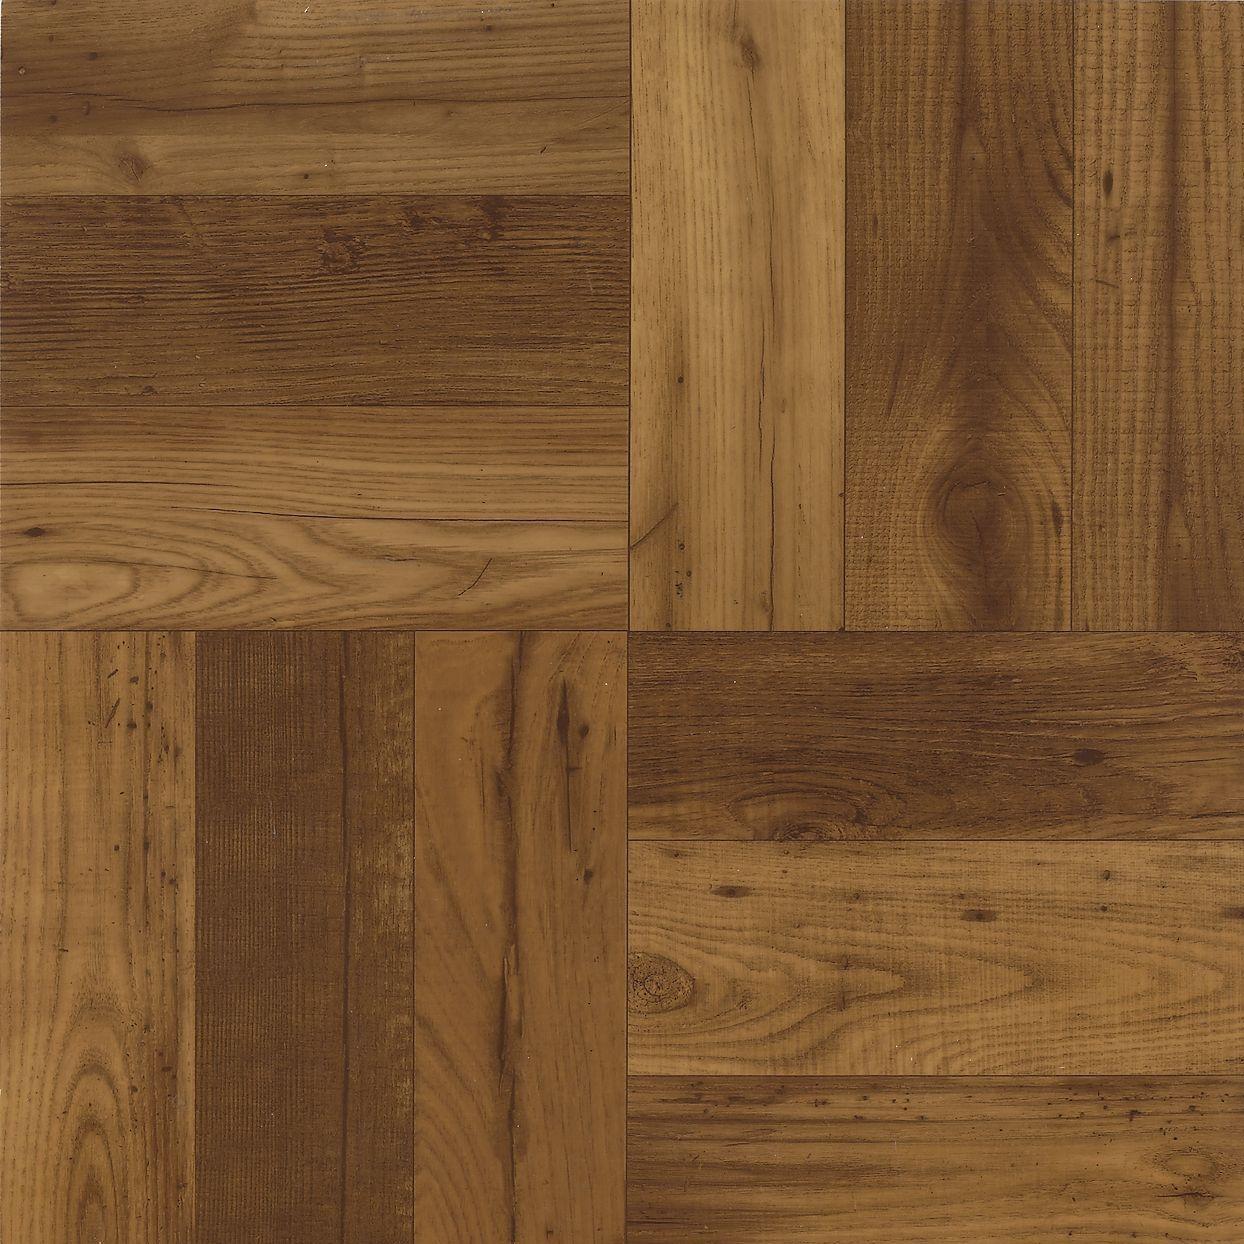 pavimento de vinilo residencial en losas aspecto madera criswood russet oak armstrong